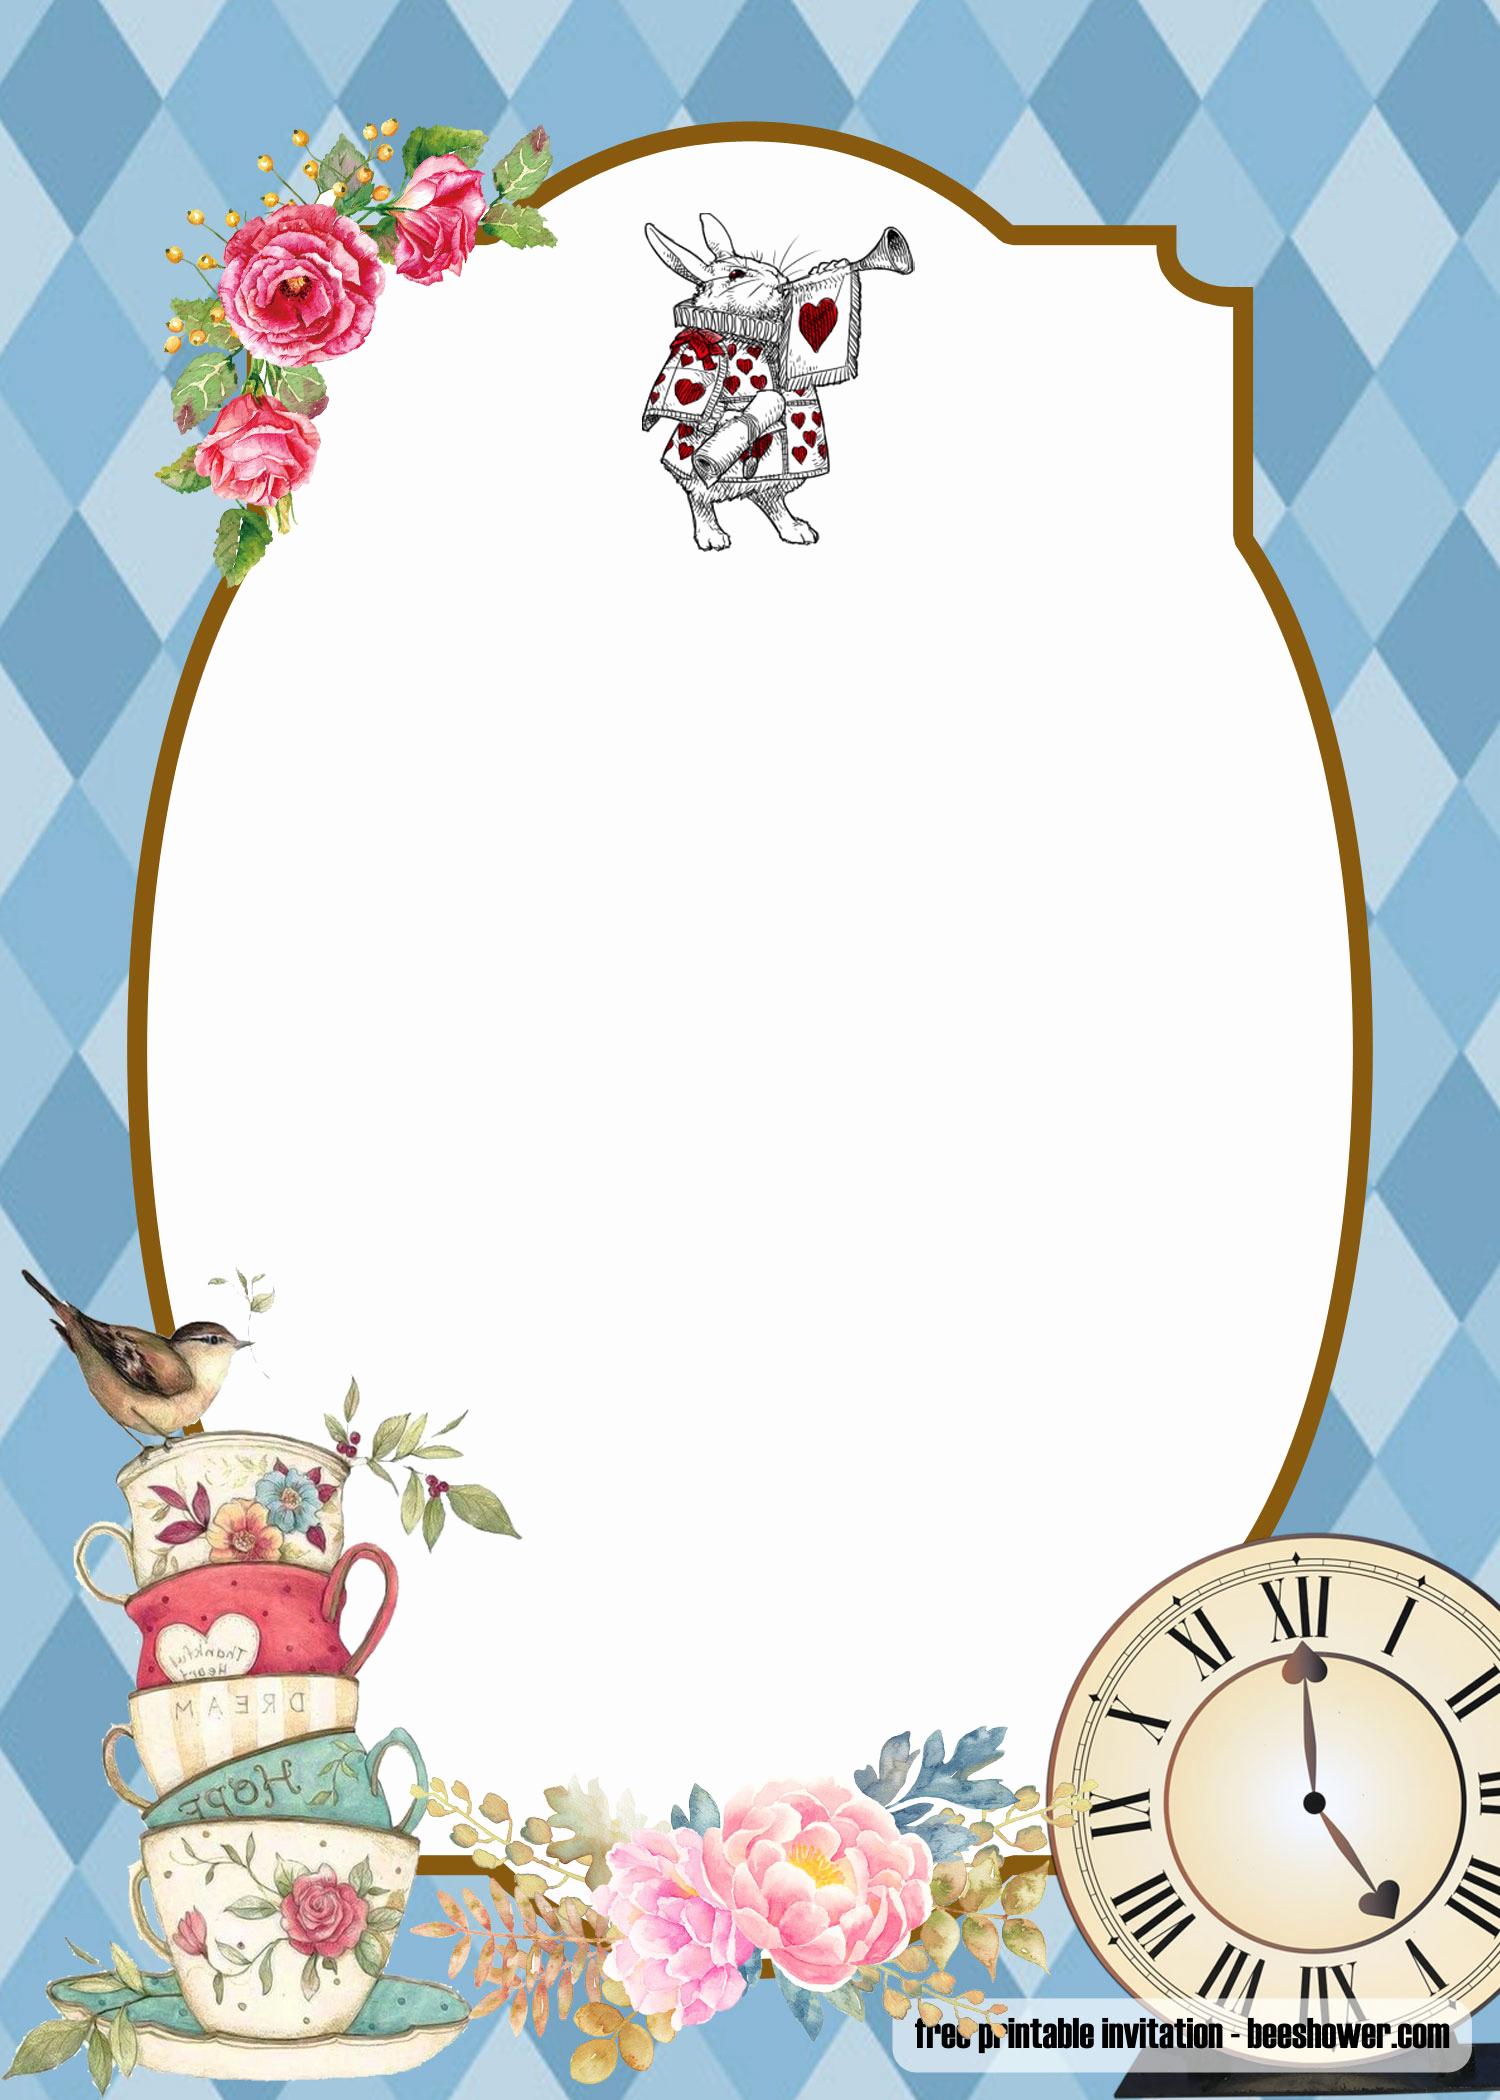 Alice In Wonderland Invitation Template Beautiful Free Alice In Wonderland Baby Shower Invitations Templates